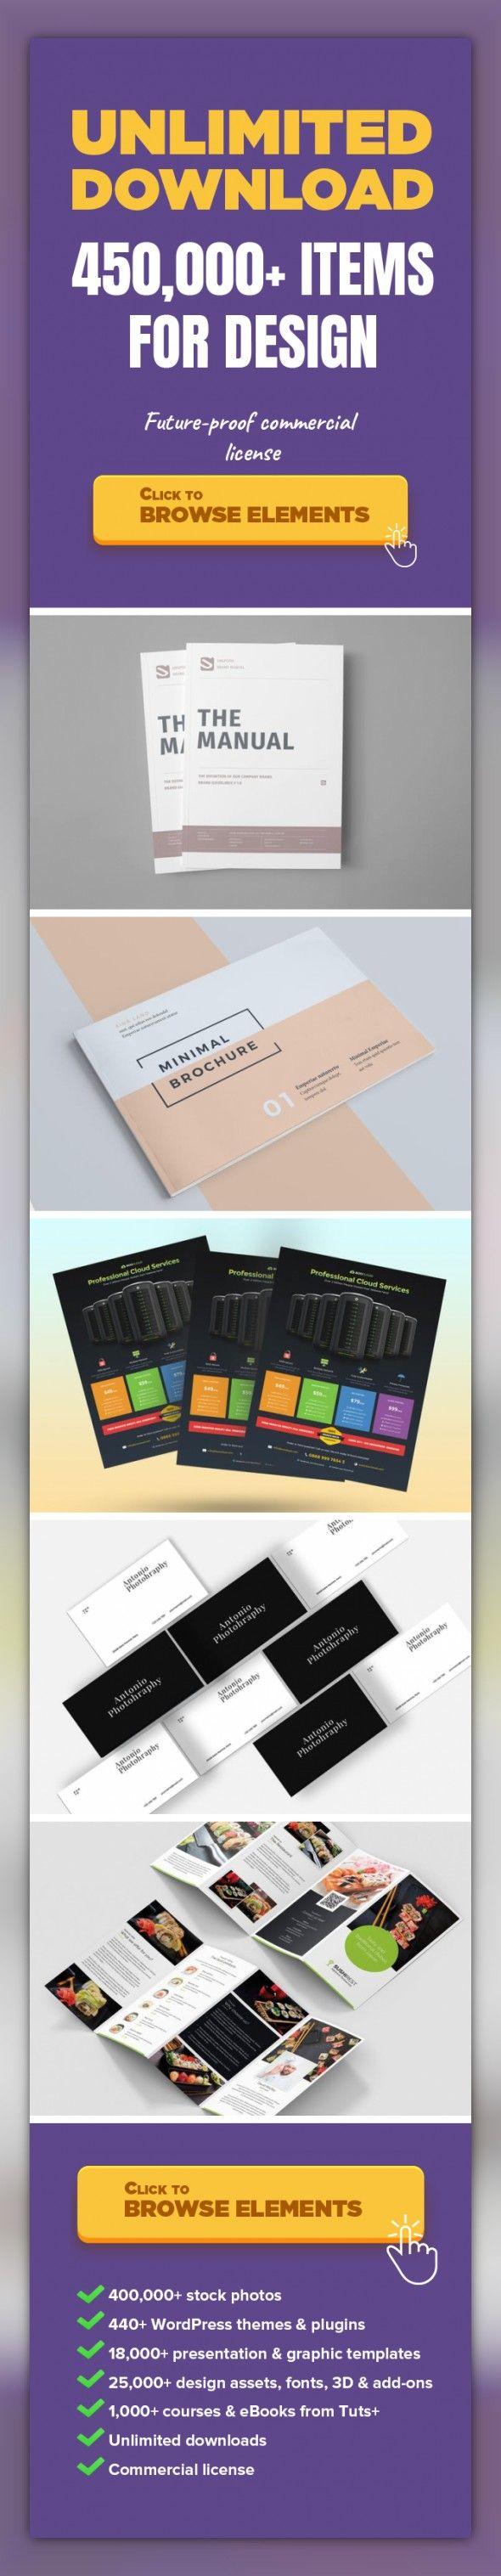 Brand Manual Graphic Templates Print Templates Brand Manual